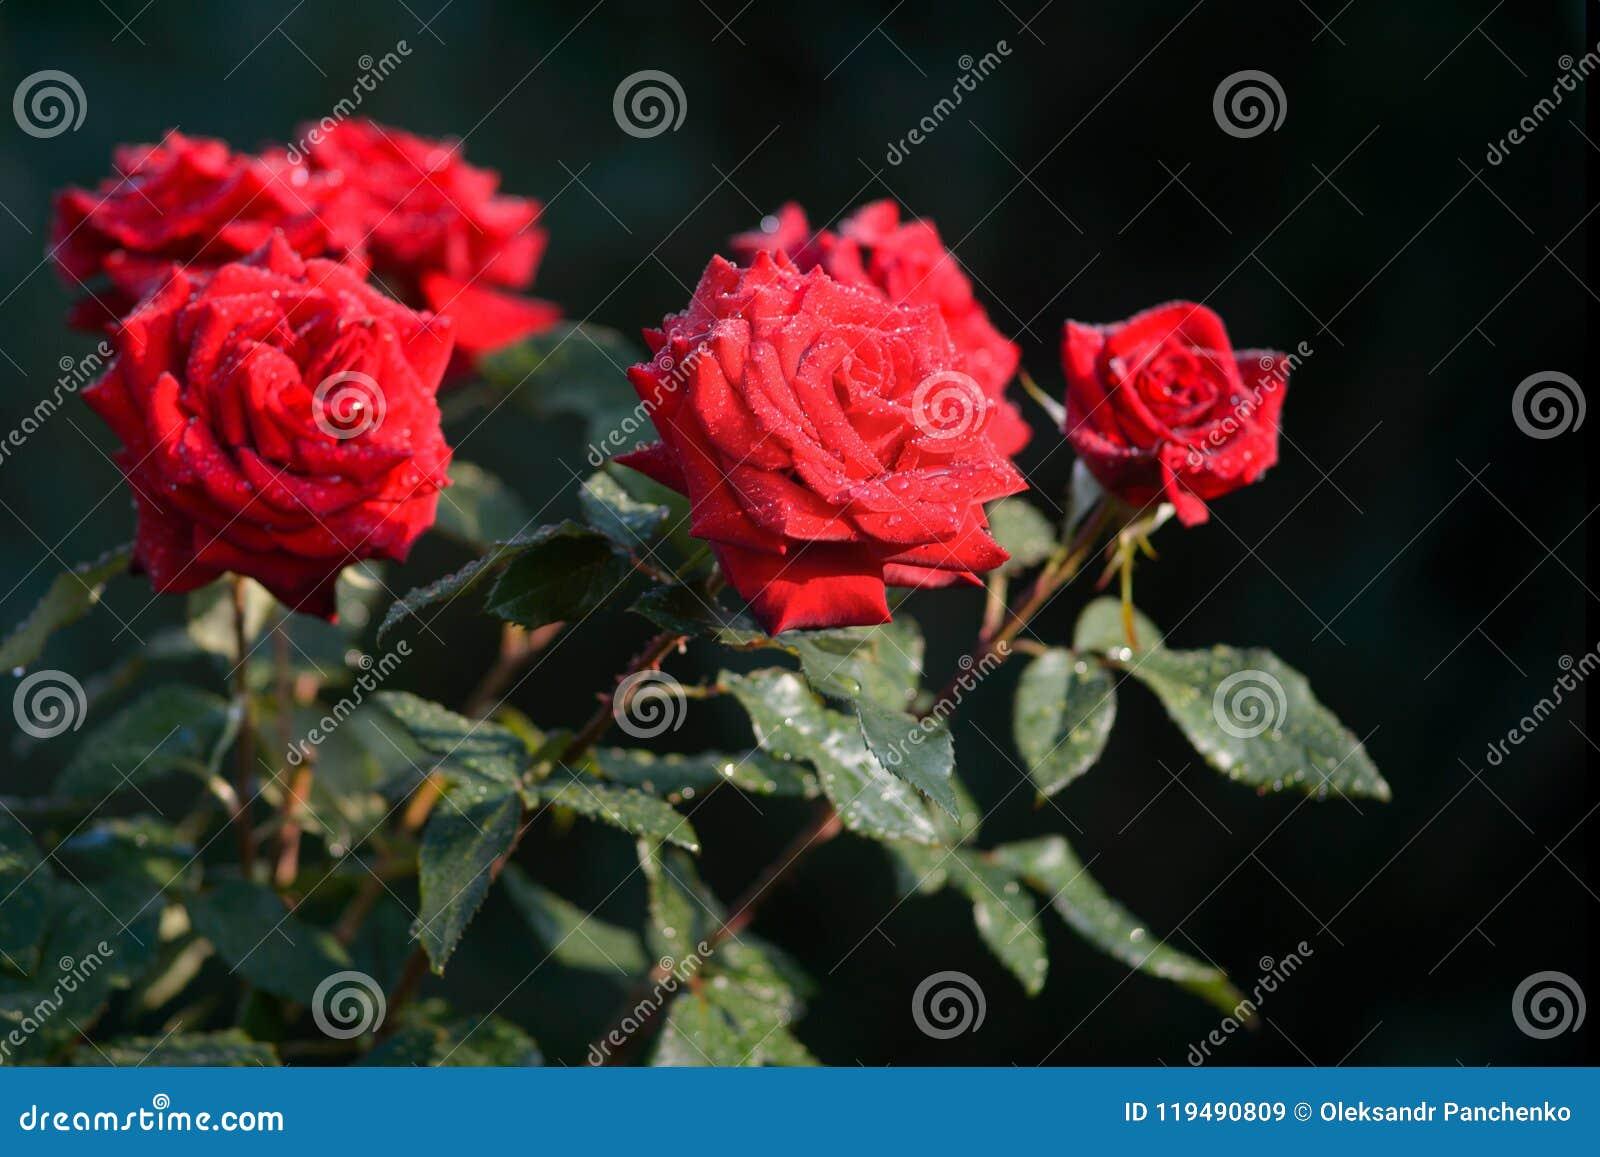 Beautiful red roses in garden symbol of passionate love flower beautiful red roses in garden symbol of passionate love flower izmirmasajfo